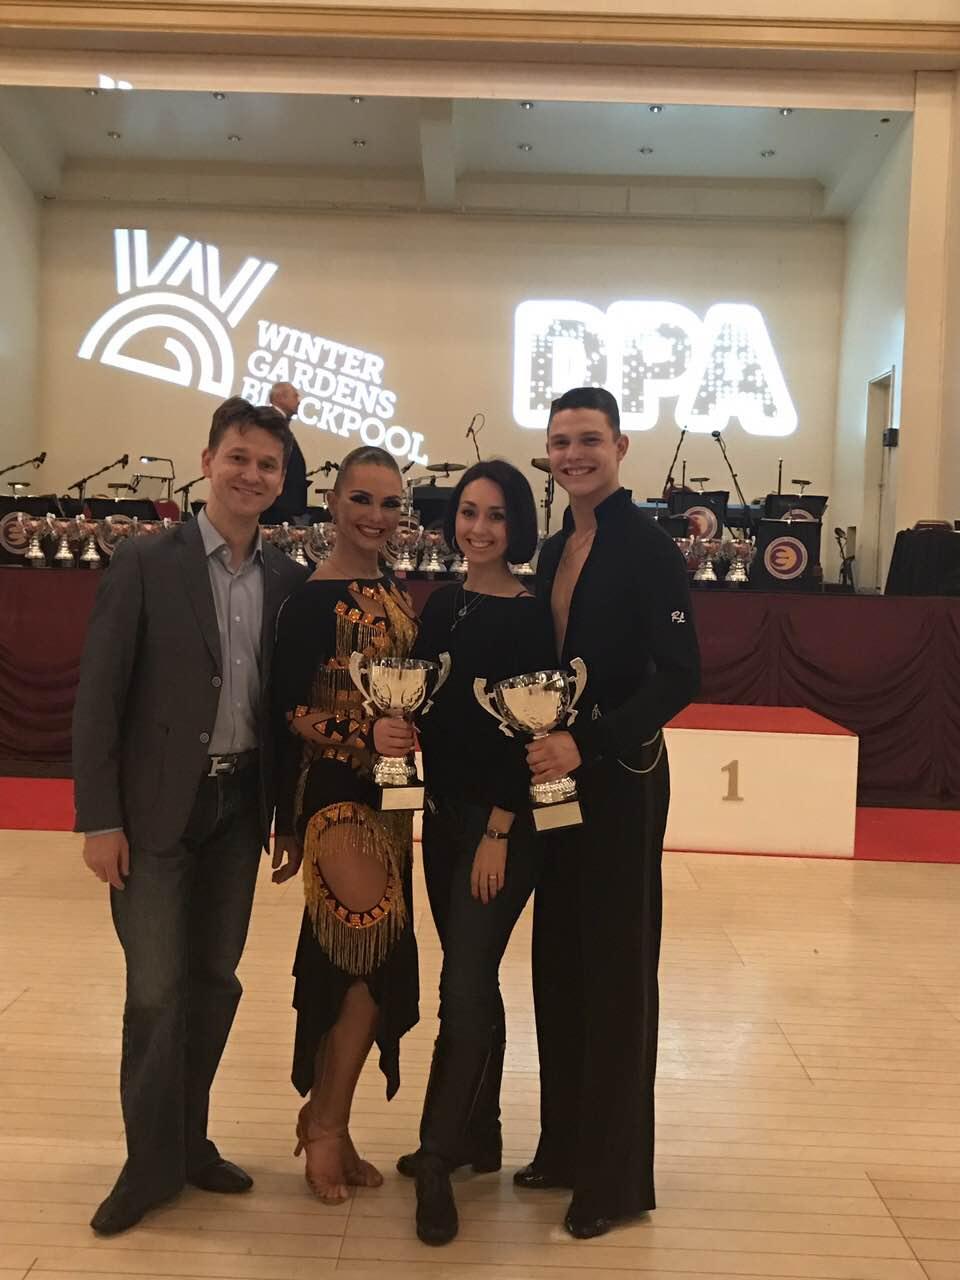 2017 WDC AL European Championship Youth1 | Roman Myrkin, Mariya Lukovets, Daniil Tymoshenko, Natalia Byednyagina